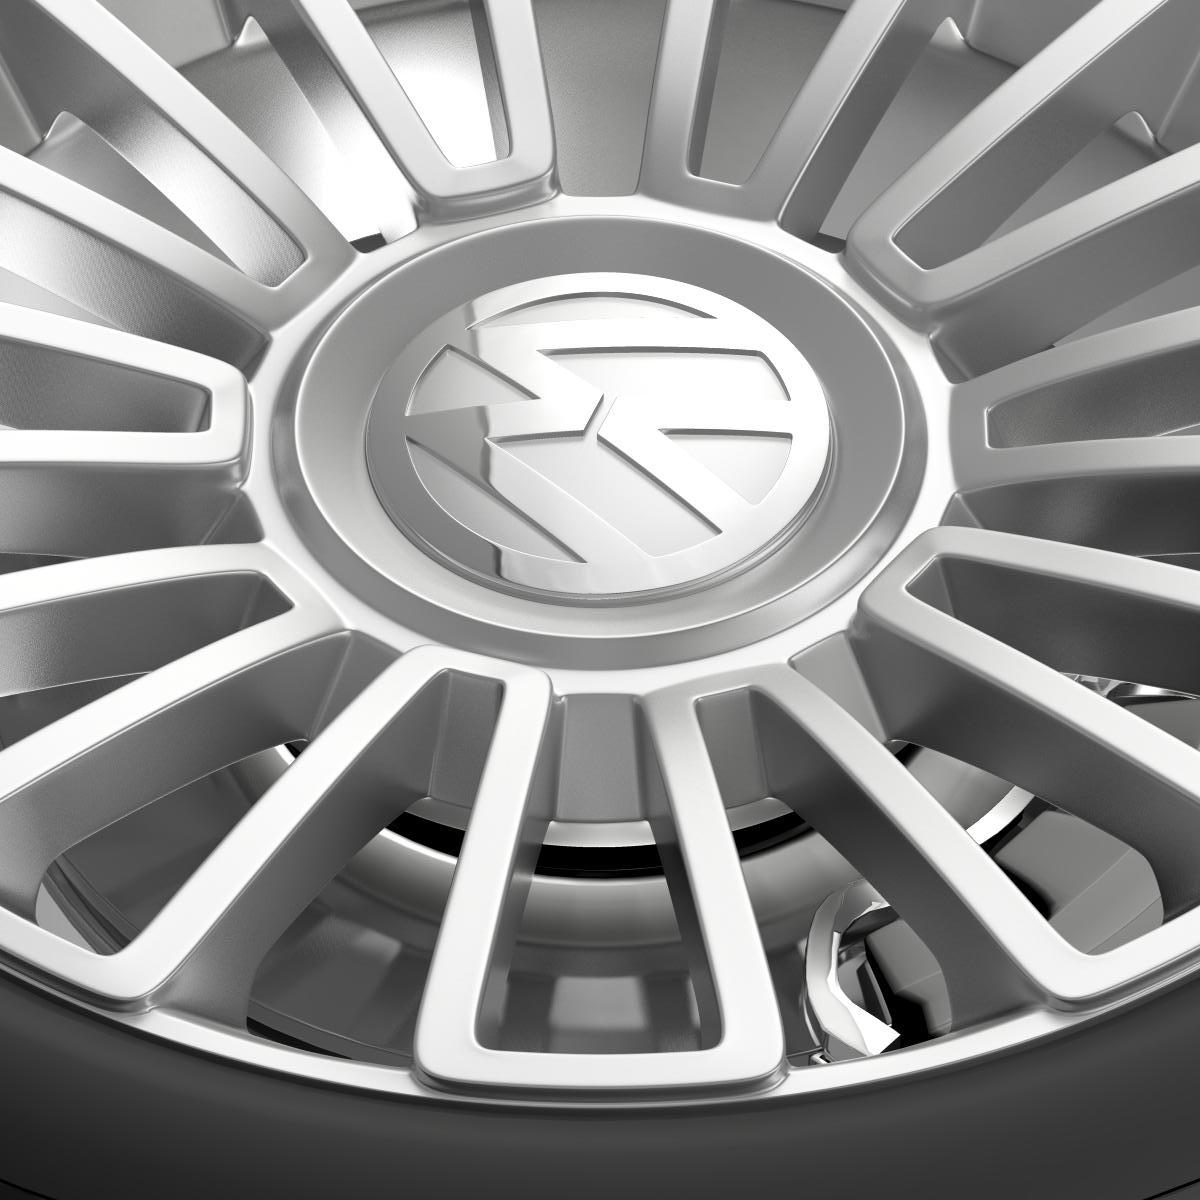 volkswagen up wheel 3d model 3ds max fbx c4d lwo ma mb hrc xsi obj 210886